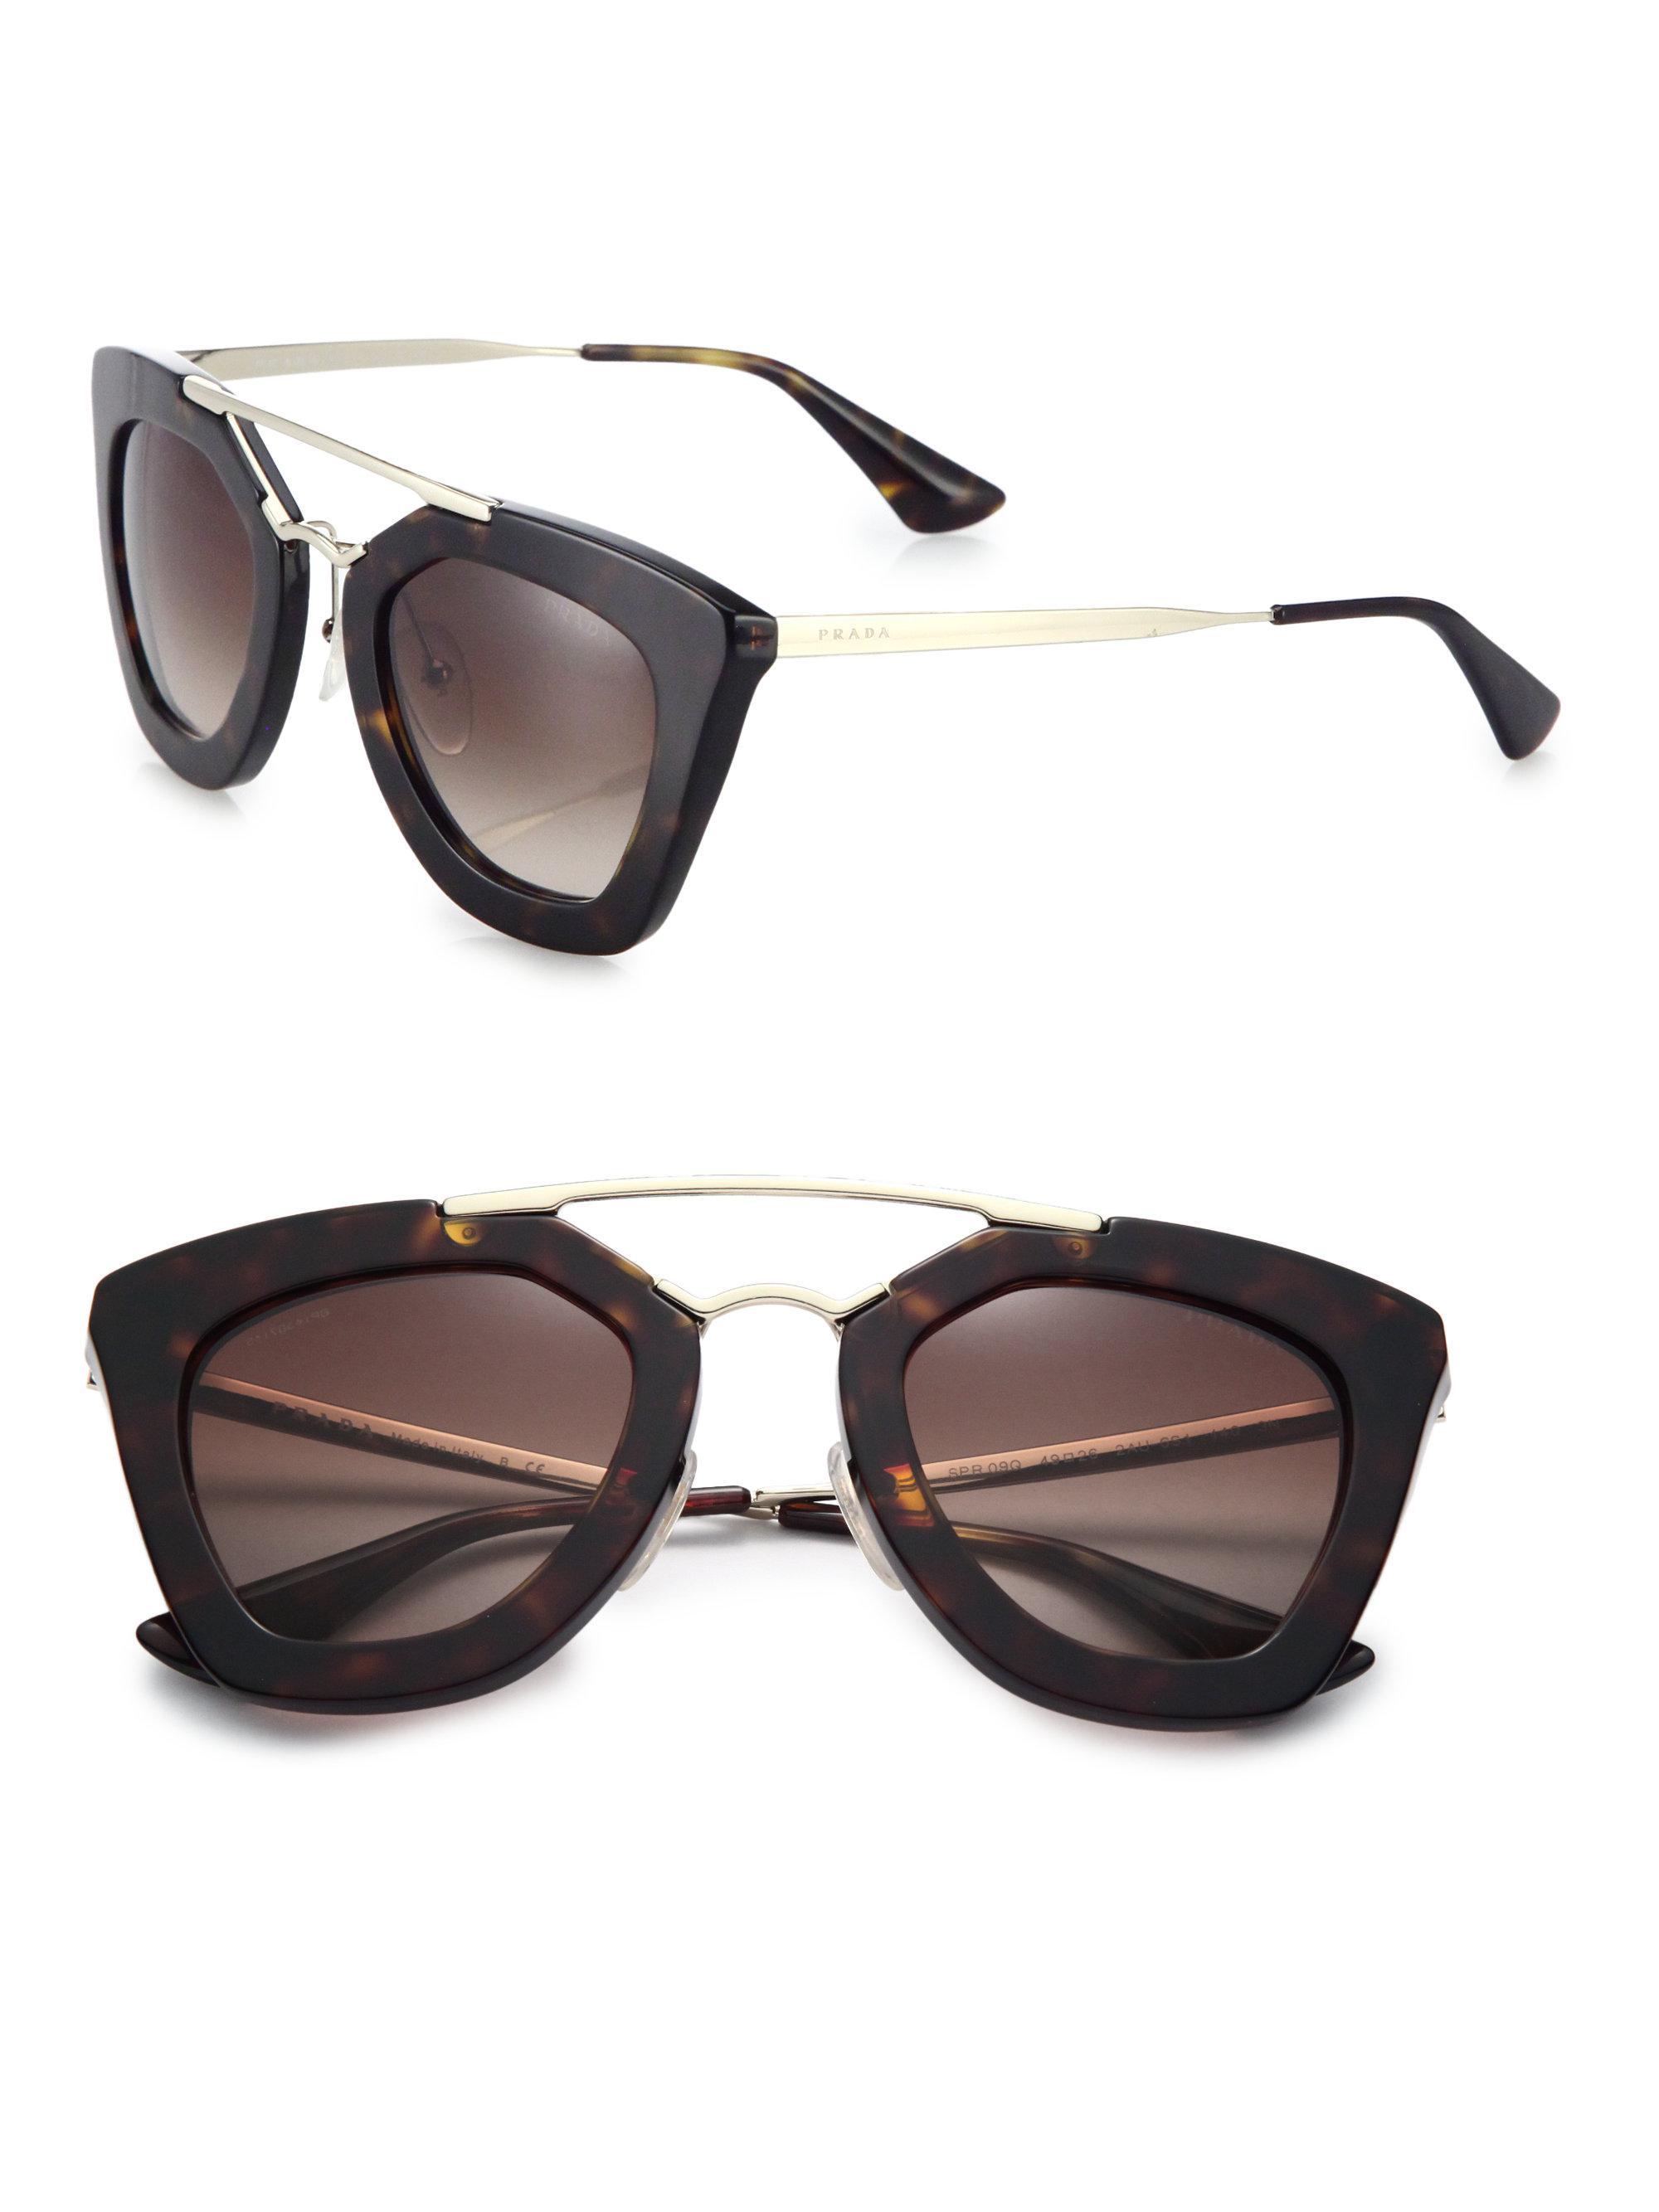 7594e4fa6f ... usa prada brown cats eye sunglasses lyst. view fullscreen 7b94b 28a06  discount prada tortoiseshell ...